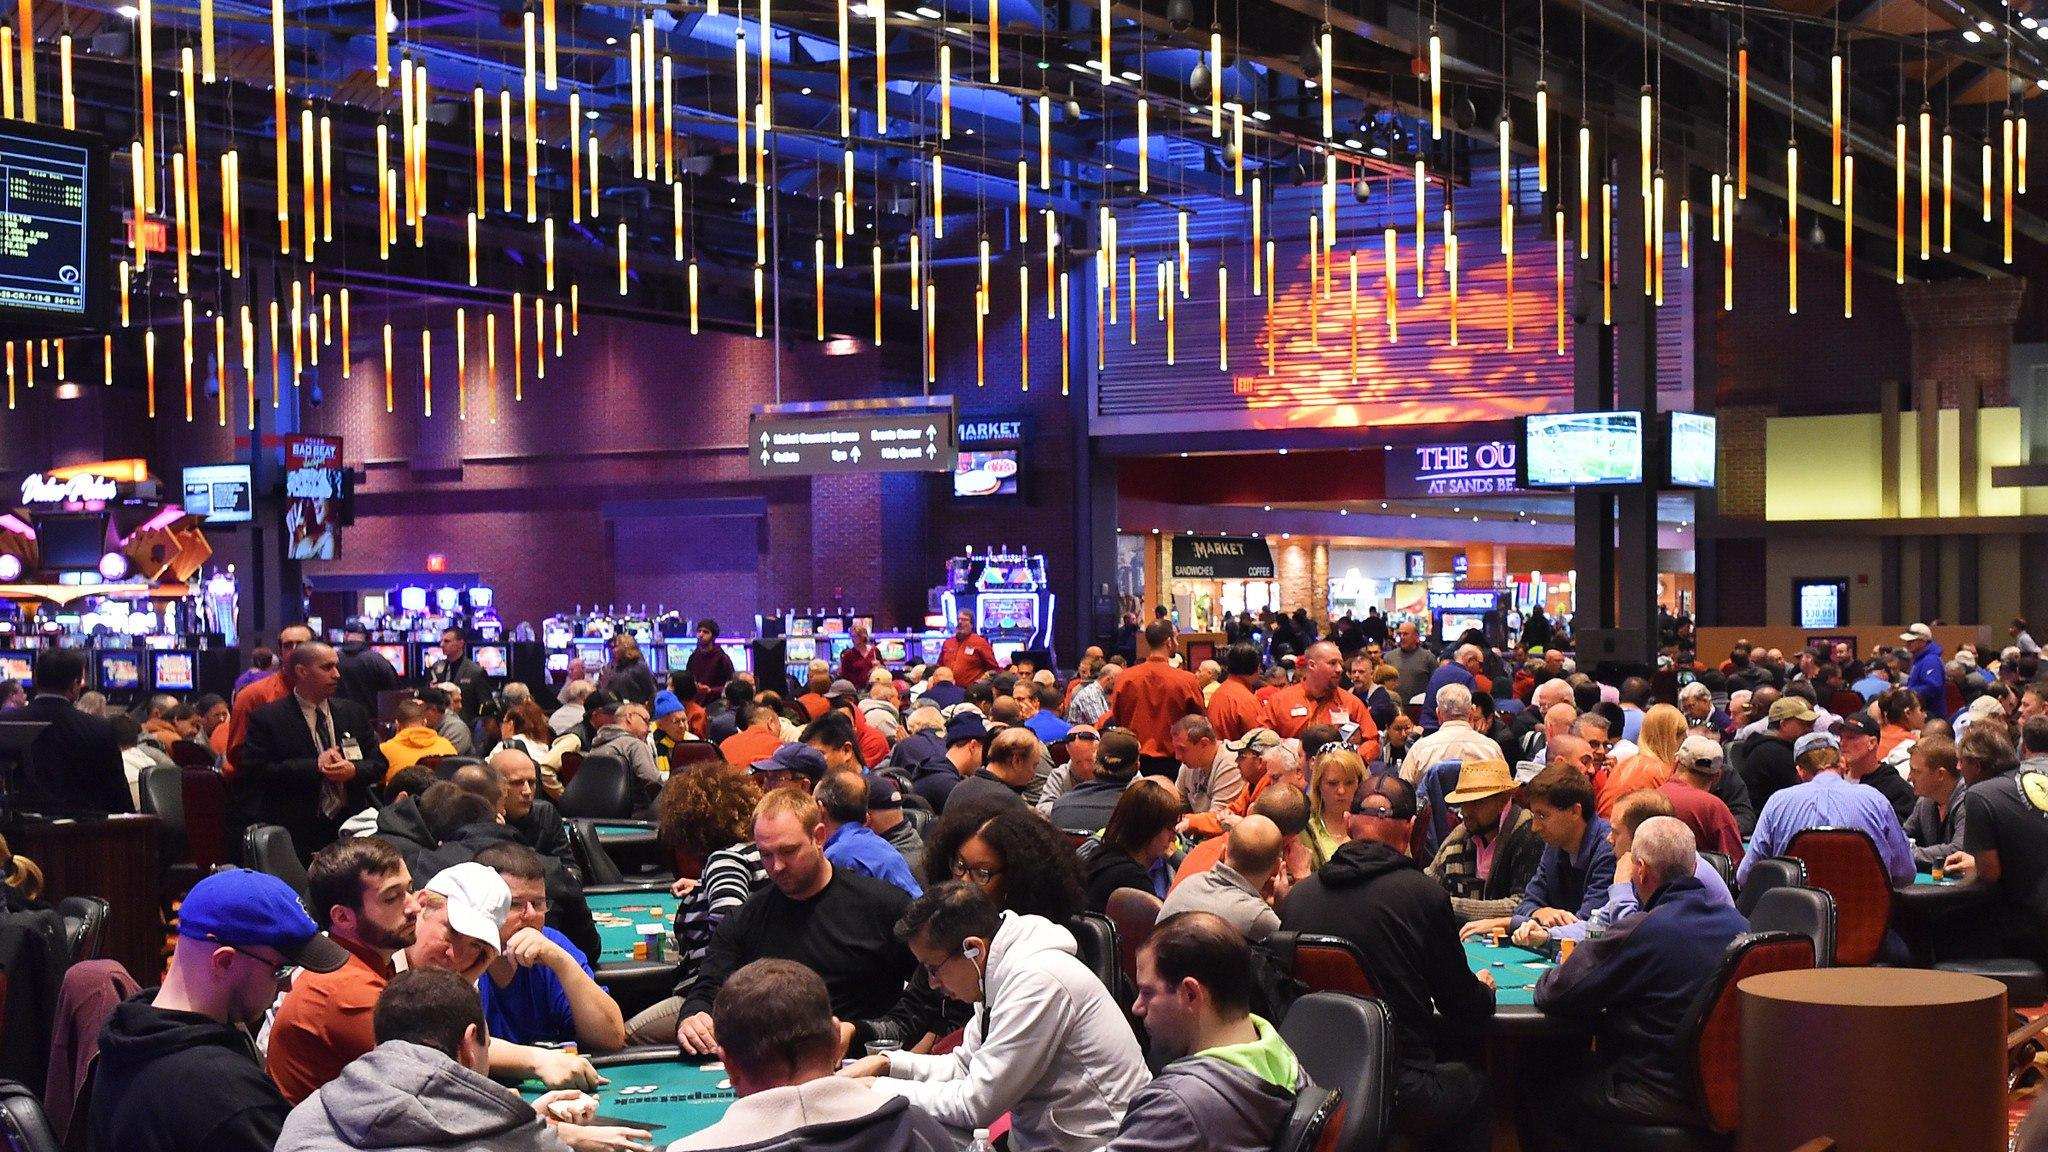 Sands casino bethlehem pa news